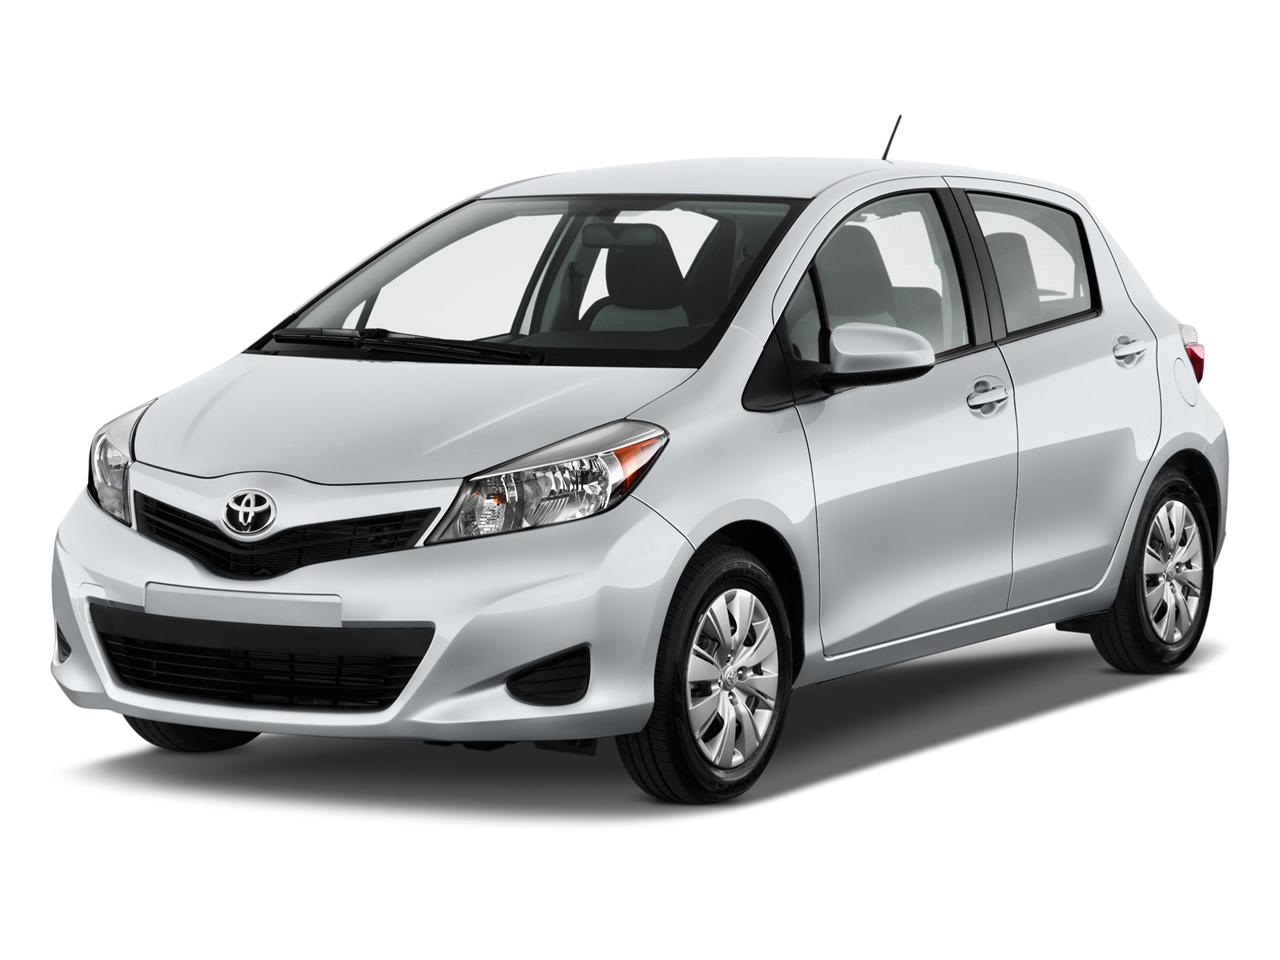 Kekurangan Toyota Yaris 2012 Harga